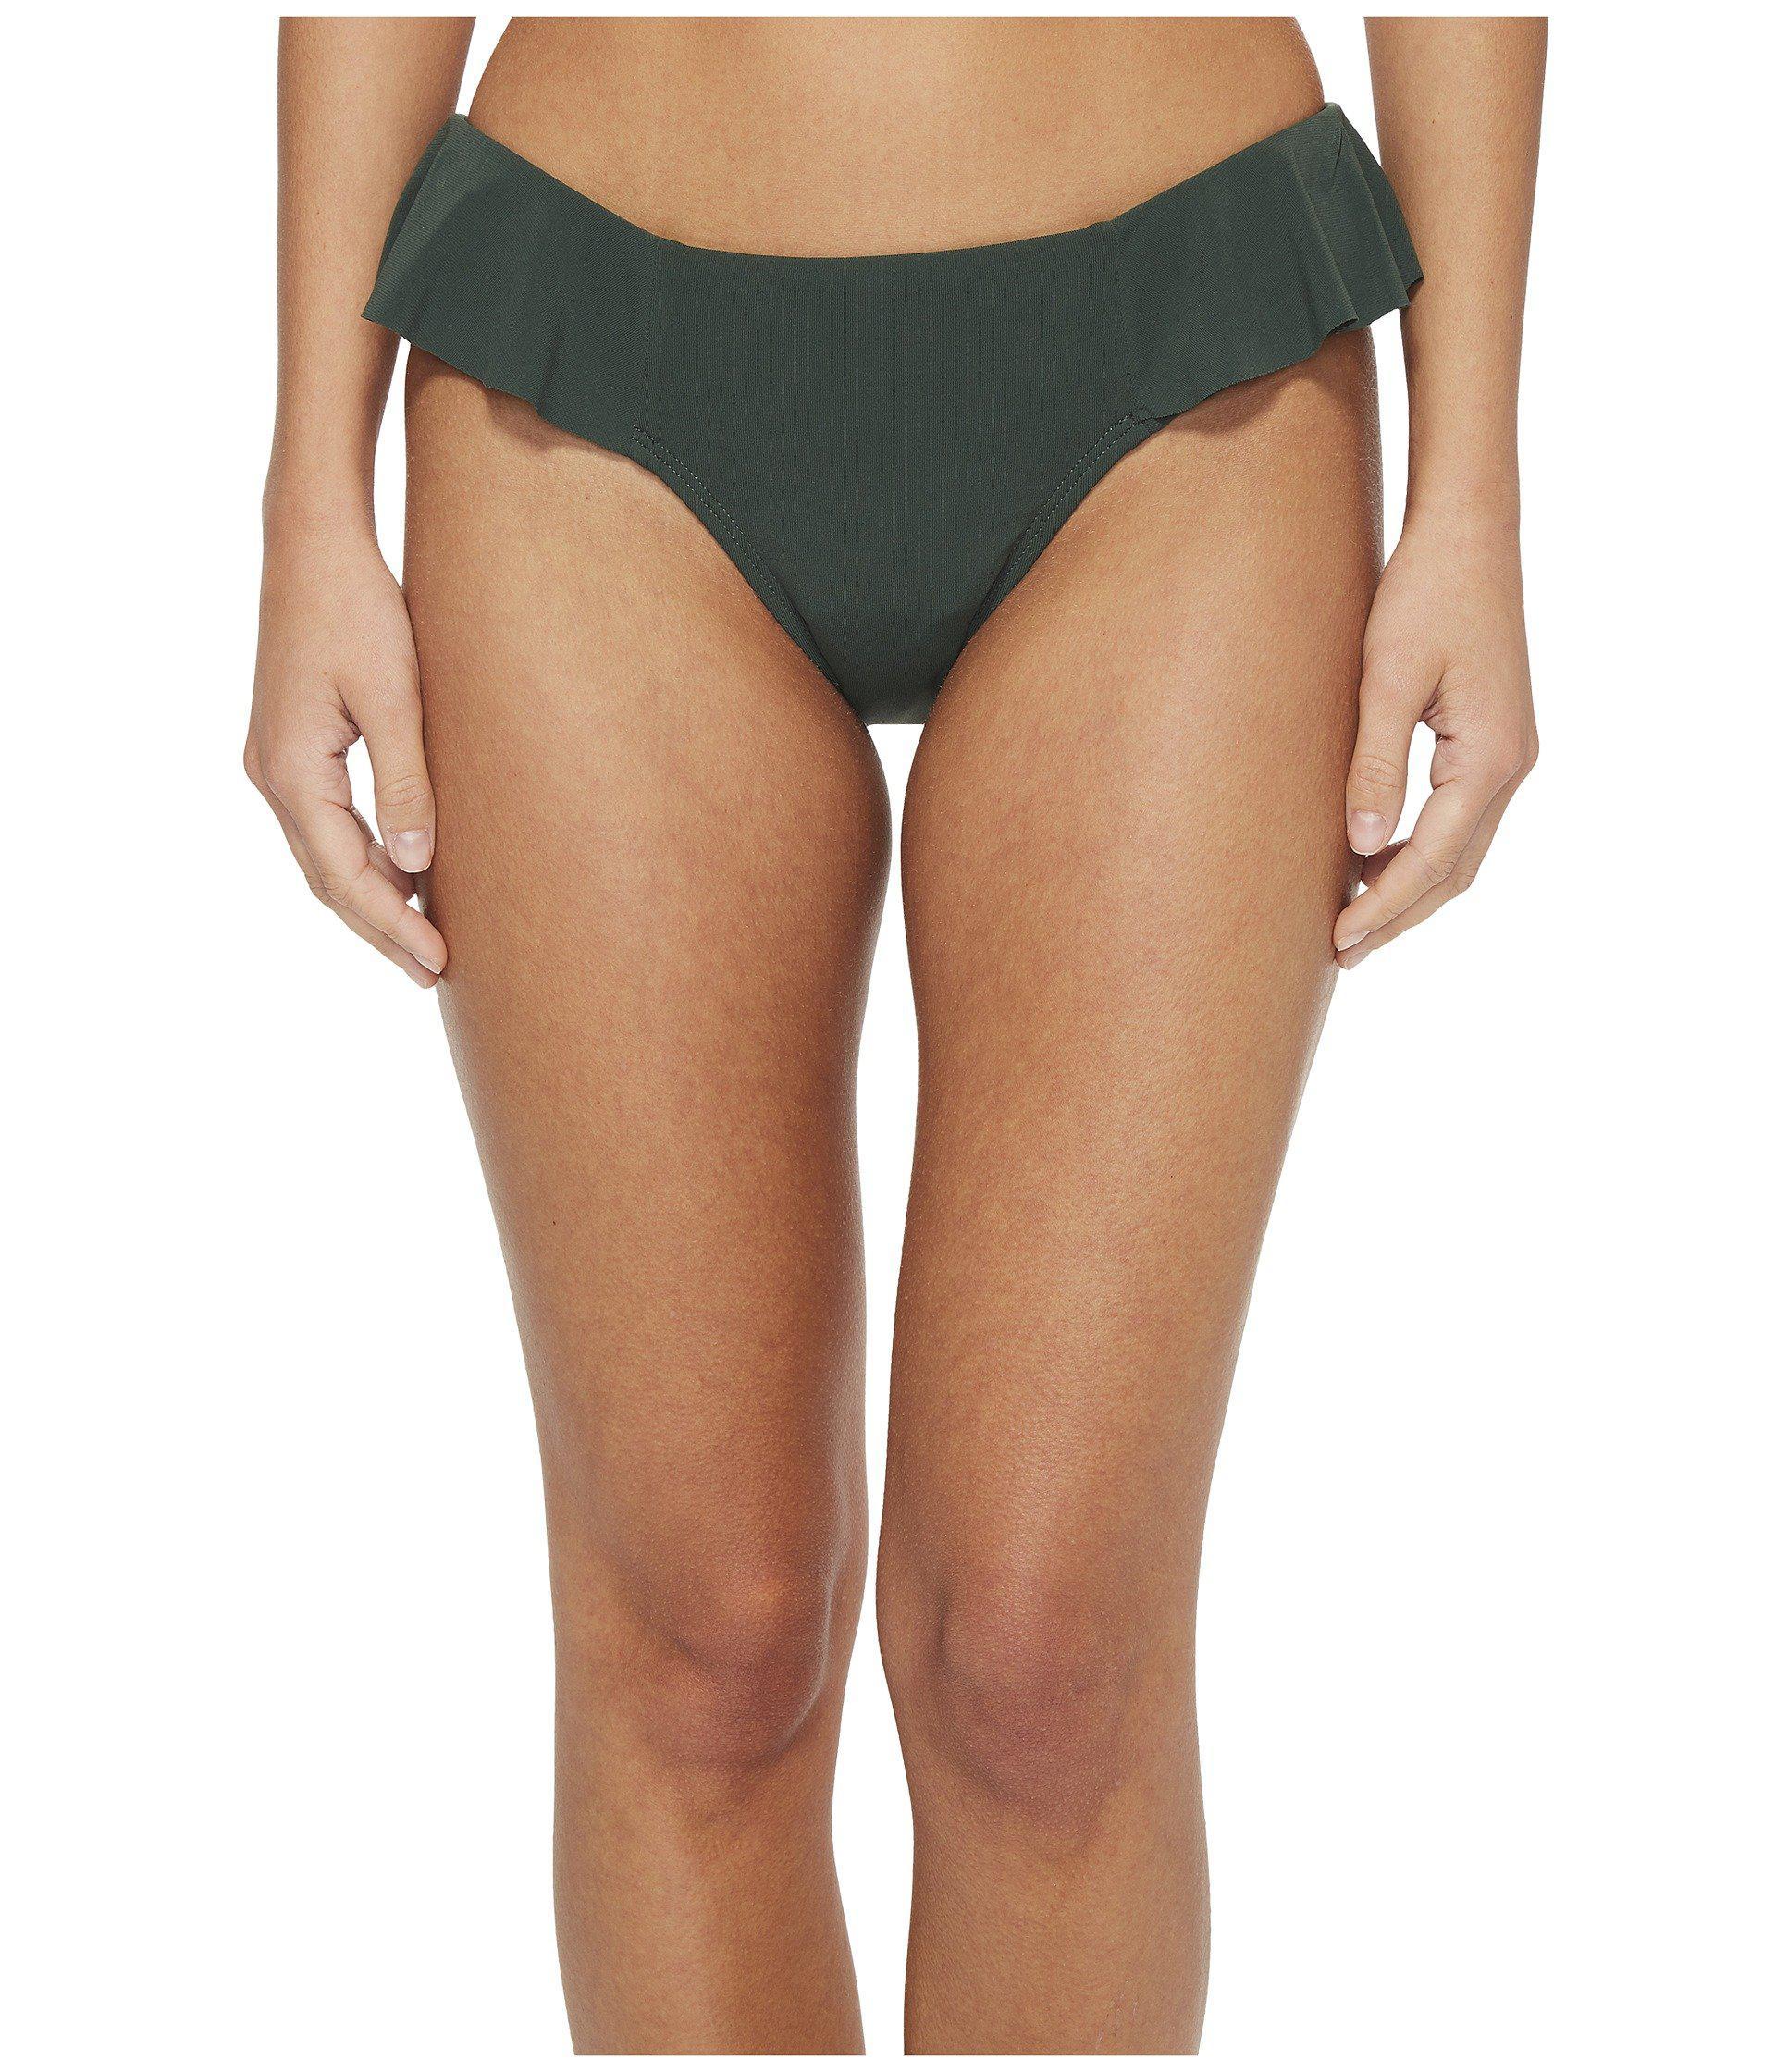 7e49b5e1678 Robin Piccone Lina Ruffle Bikini Bottom in Green - Lyst